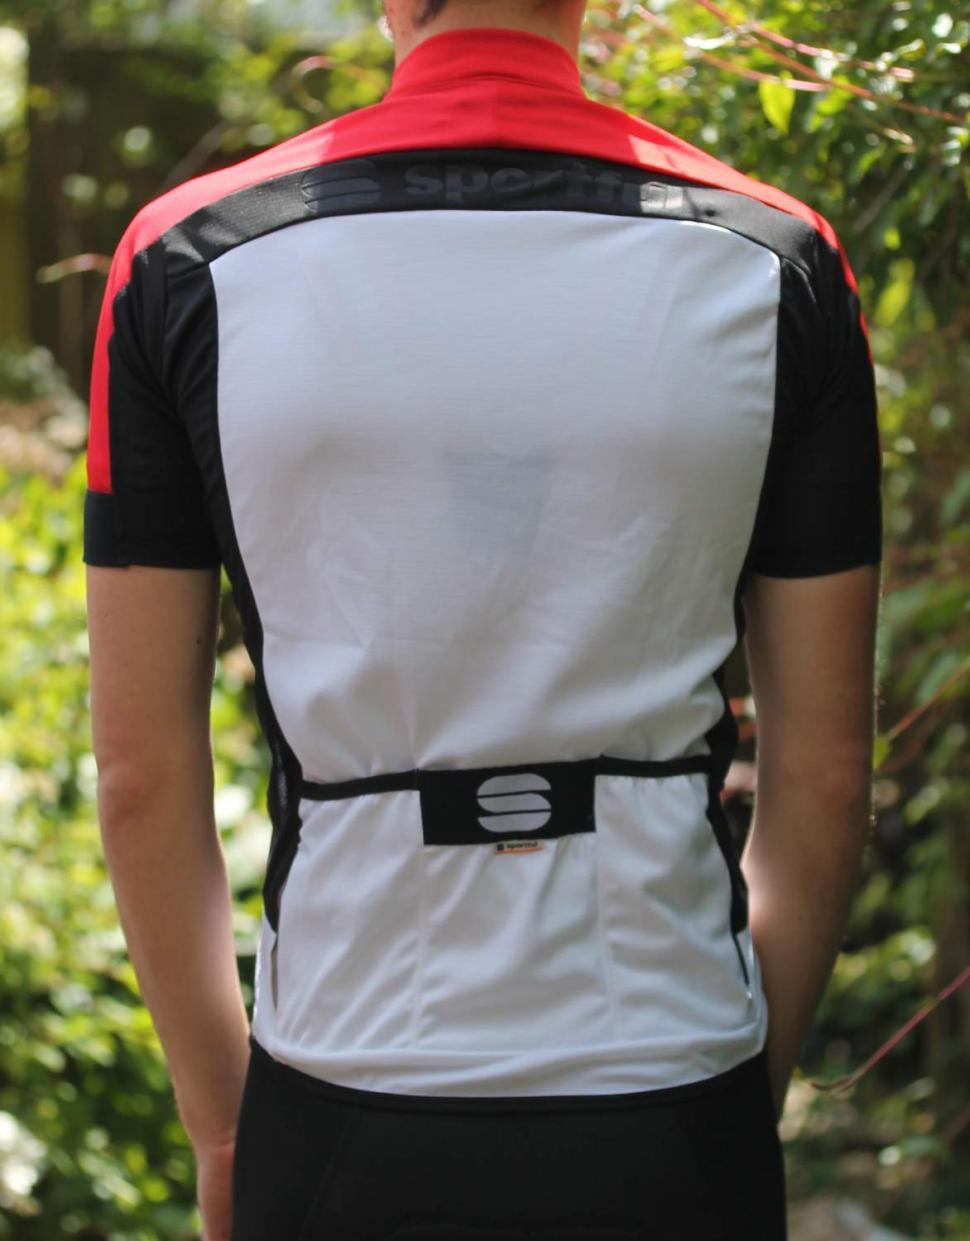 88bdbd454 1   3. Sportful Pista Long Zip Jersey - front